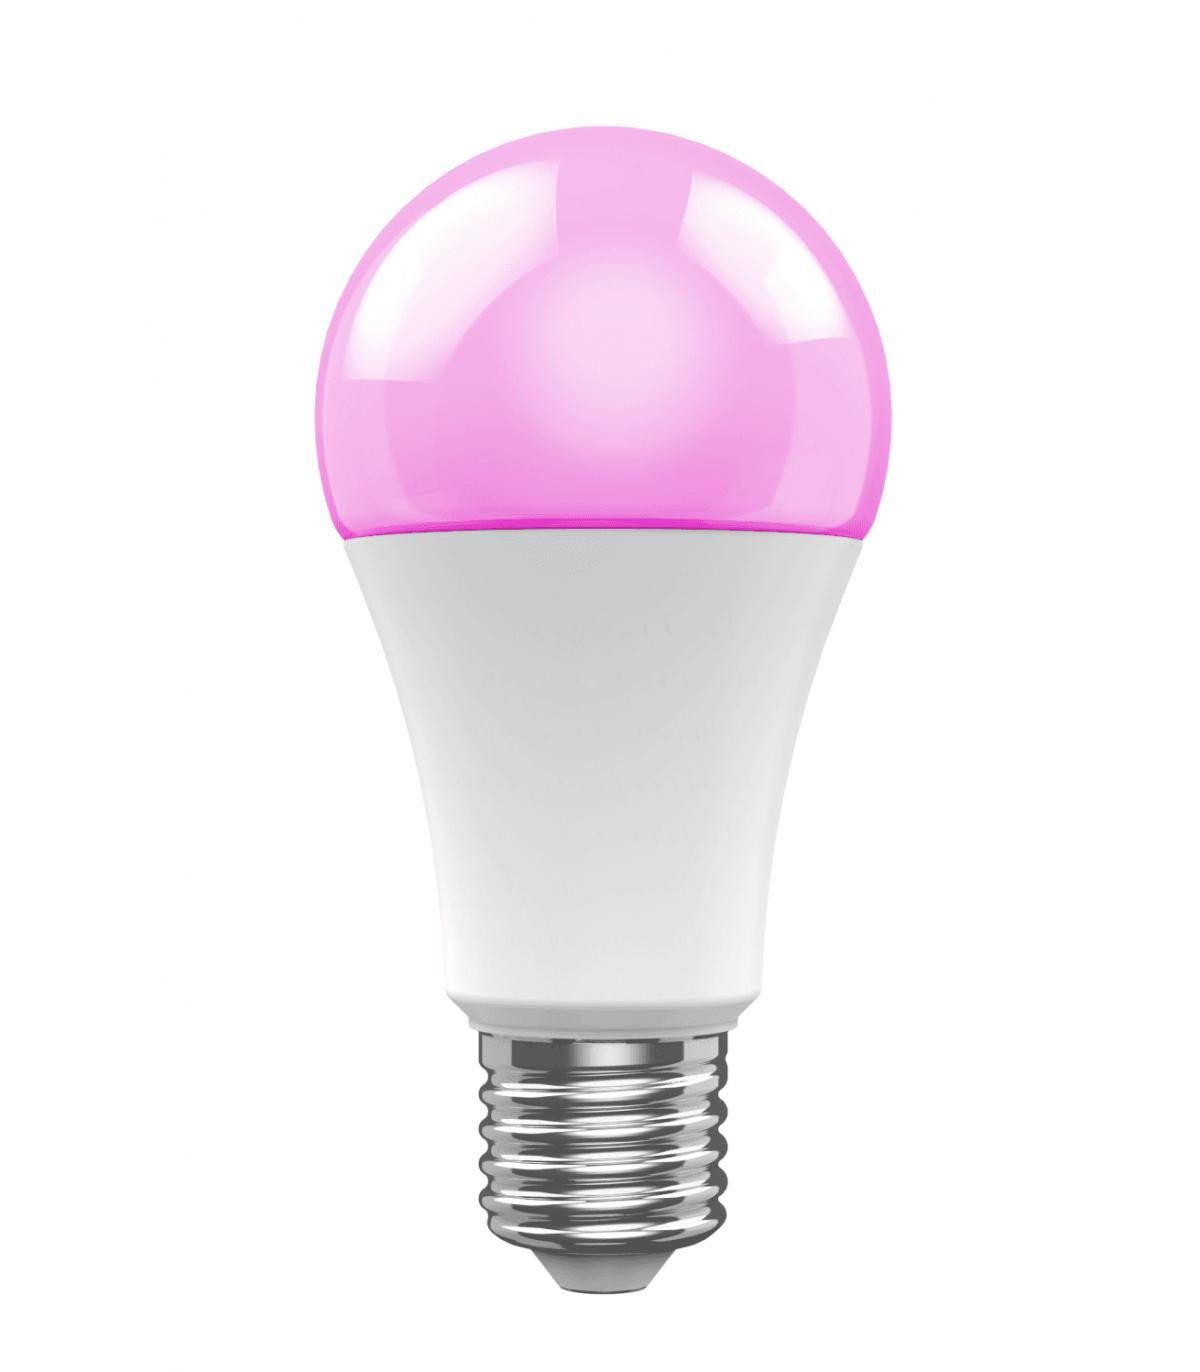 Żarówka RGB LED ZigBee 10W E27 Philips Hue Tuya